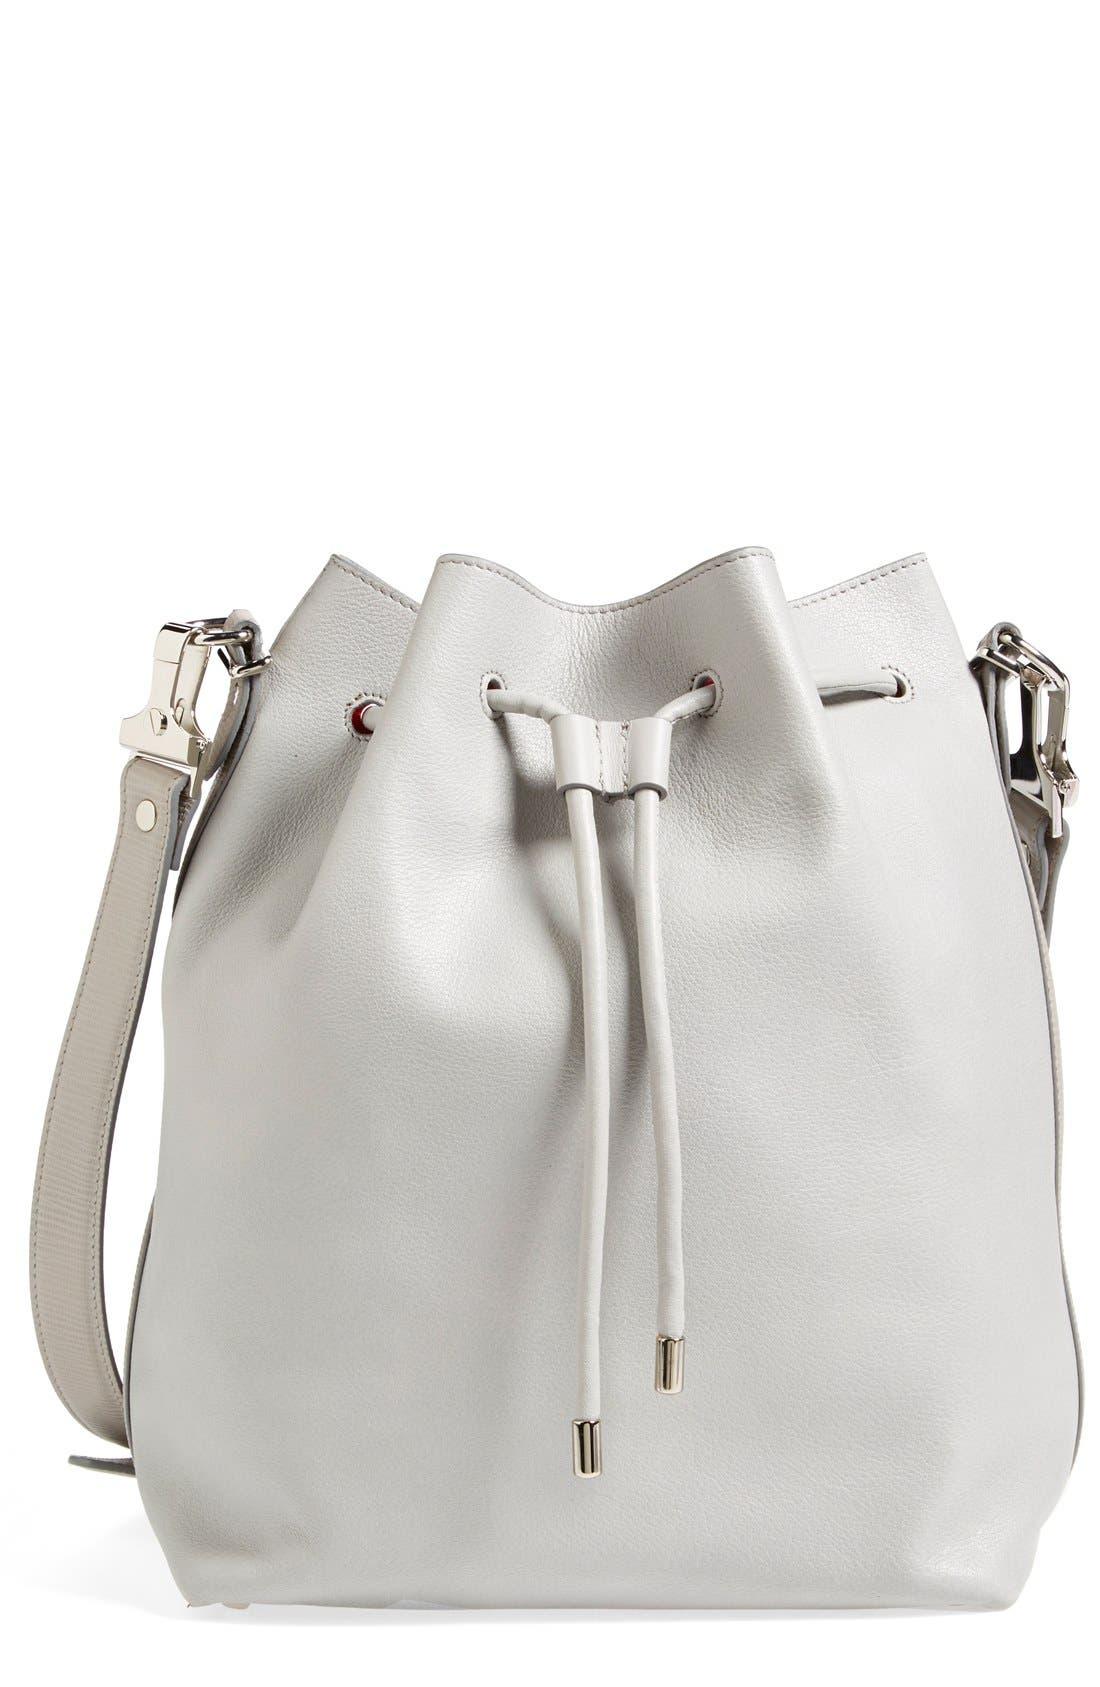 Alternate Image 1 Selected - Proenza Schouler 'Medium' Bucket Bag